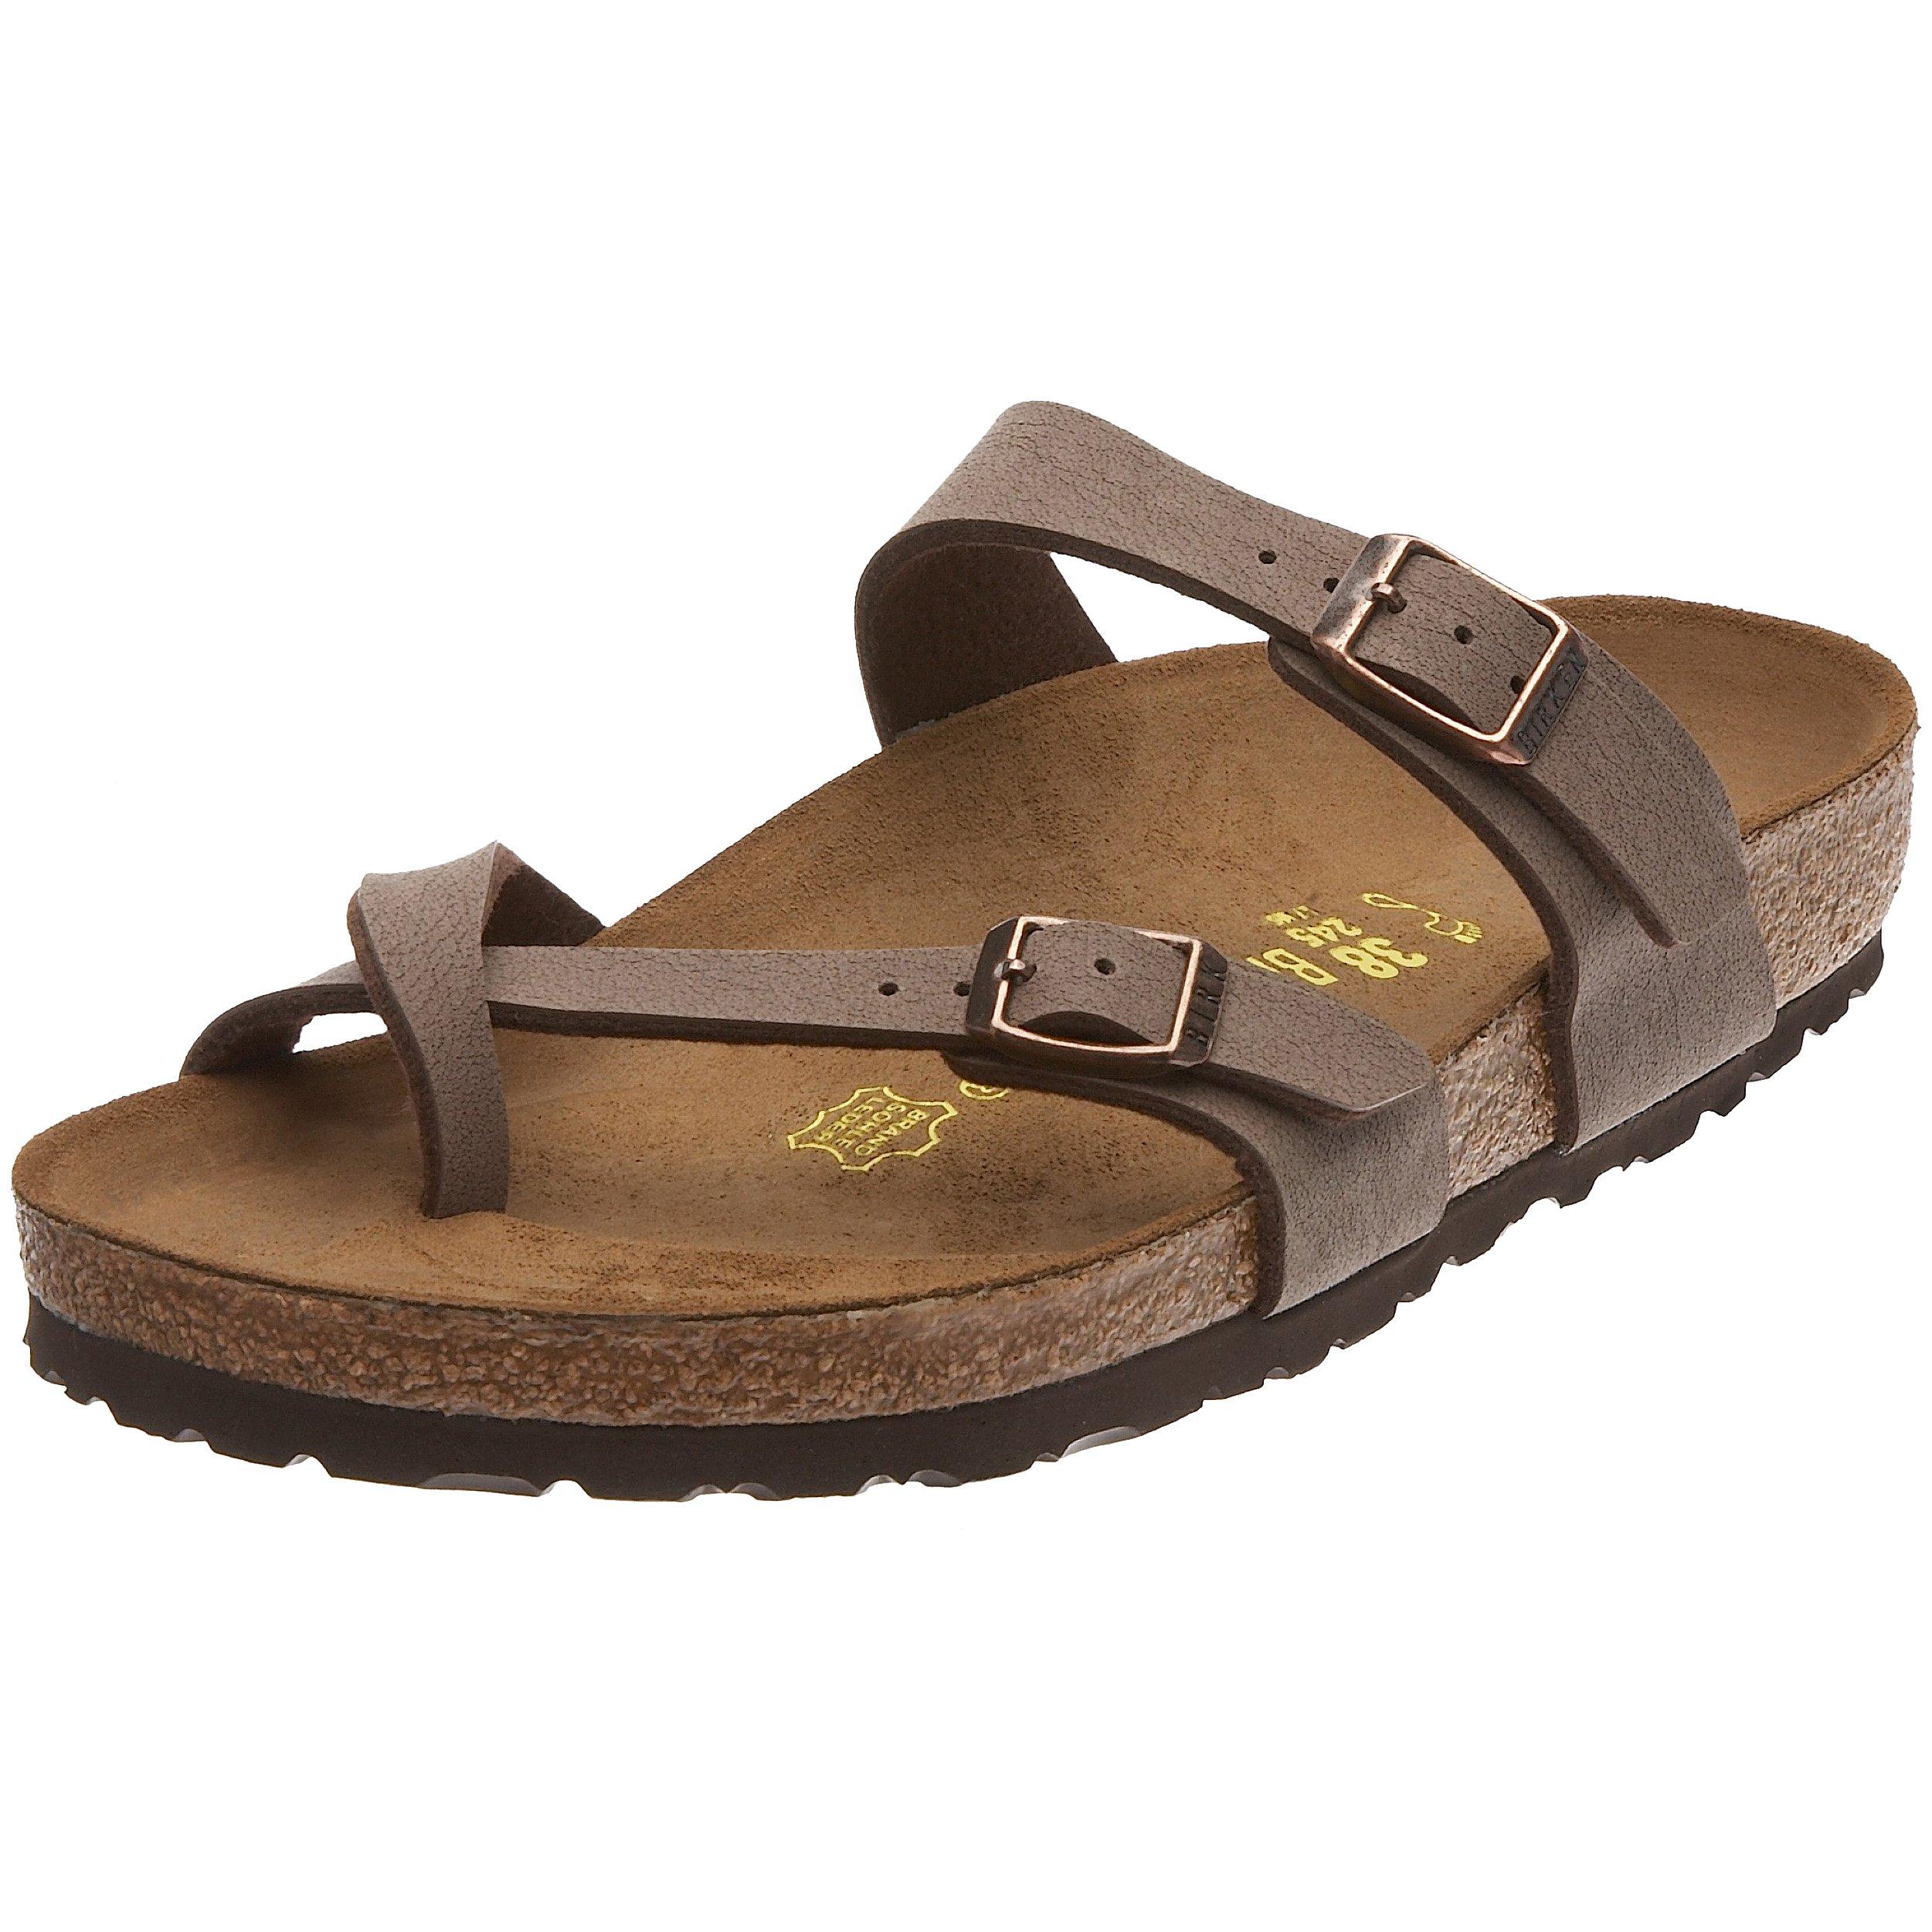 Birkenstock Womens Mayari Holiday Birko-Flor Beach Summer Flat Sandals - Mocha - 9 by Birkenstock